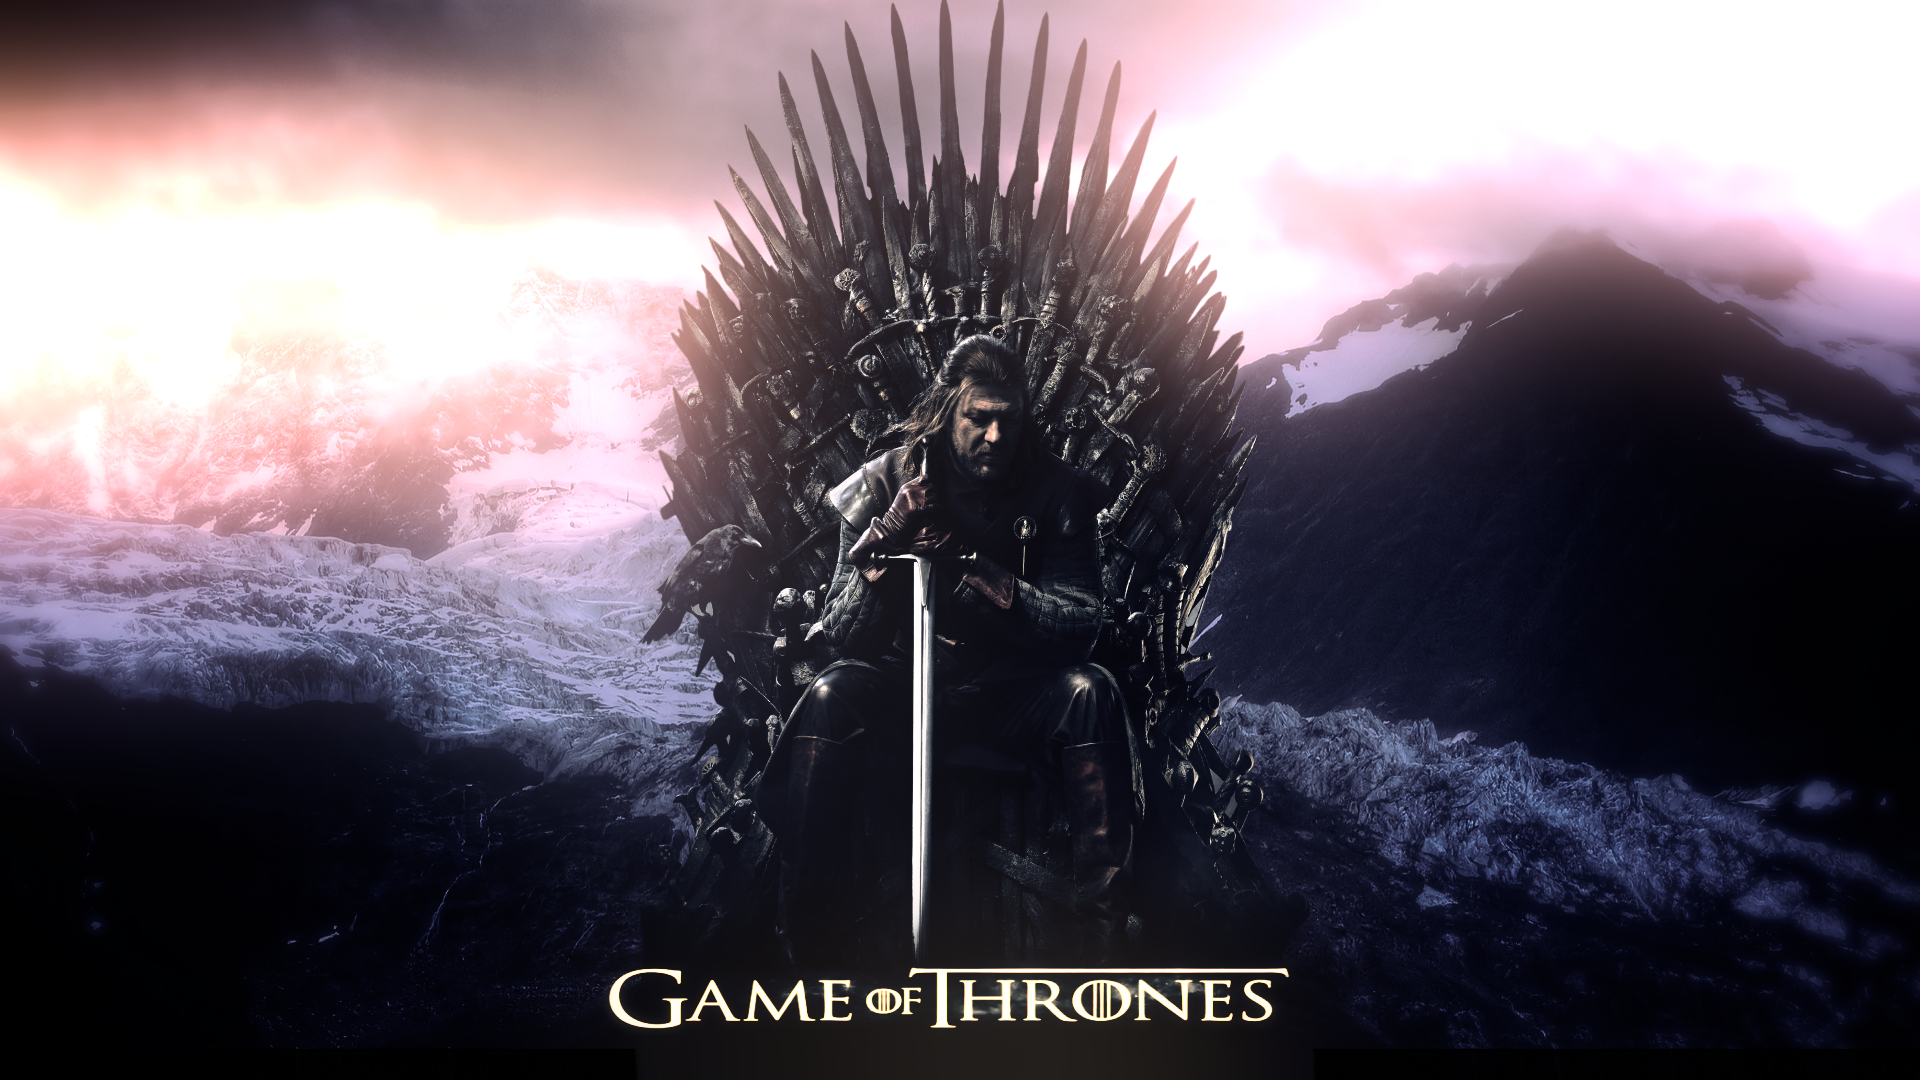 General 1920x1080 TV Series Game of Thrones Ned Stark Sean Bean Iron Throne